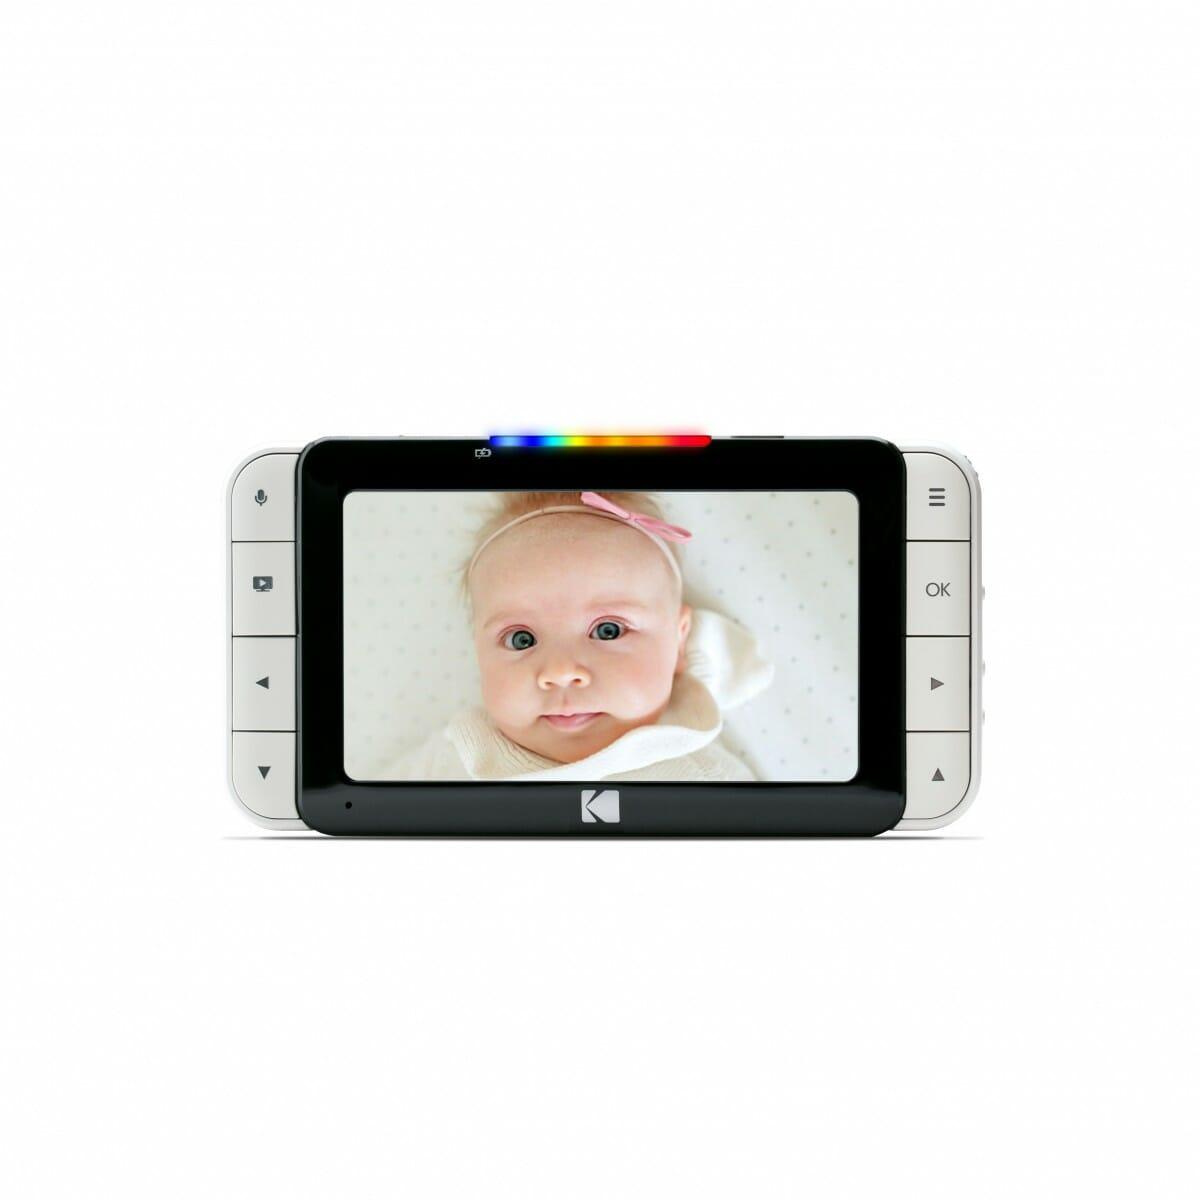 Kodak Smarthome Baby Monitor 5 C520